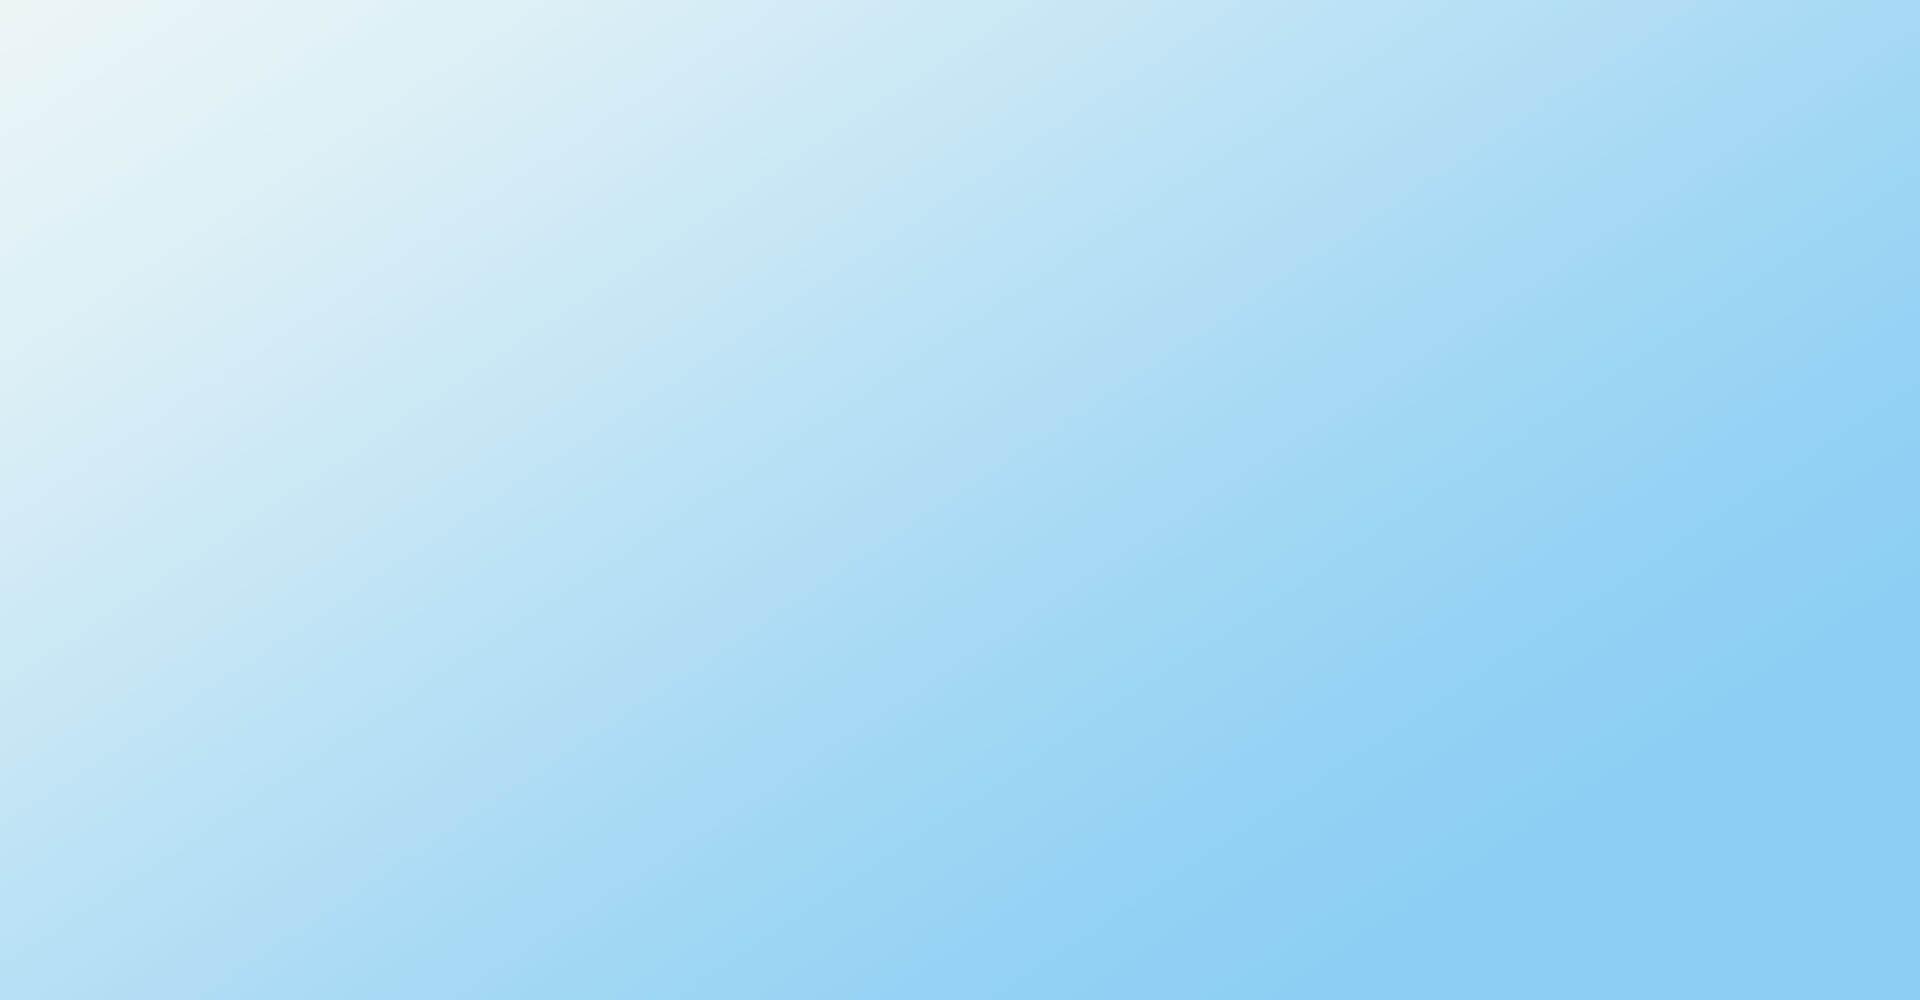 blauwe achtergrond gronsveld